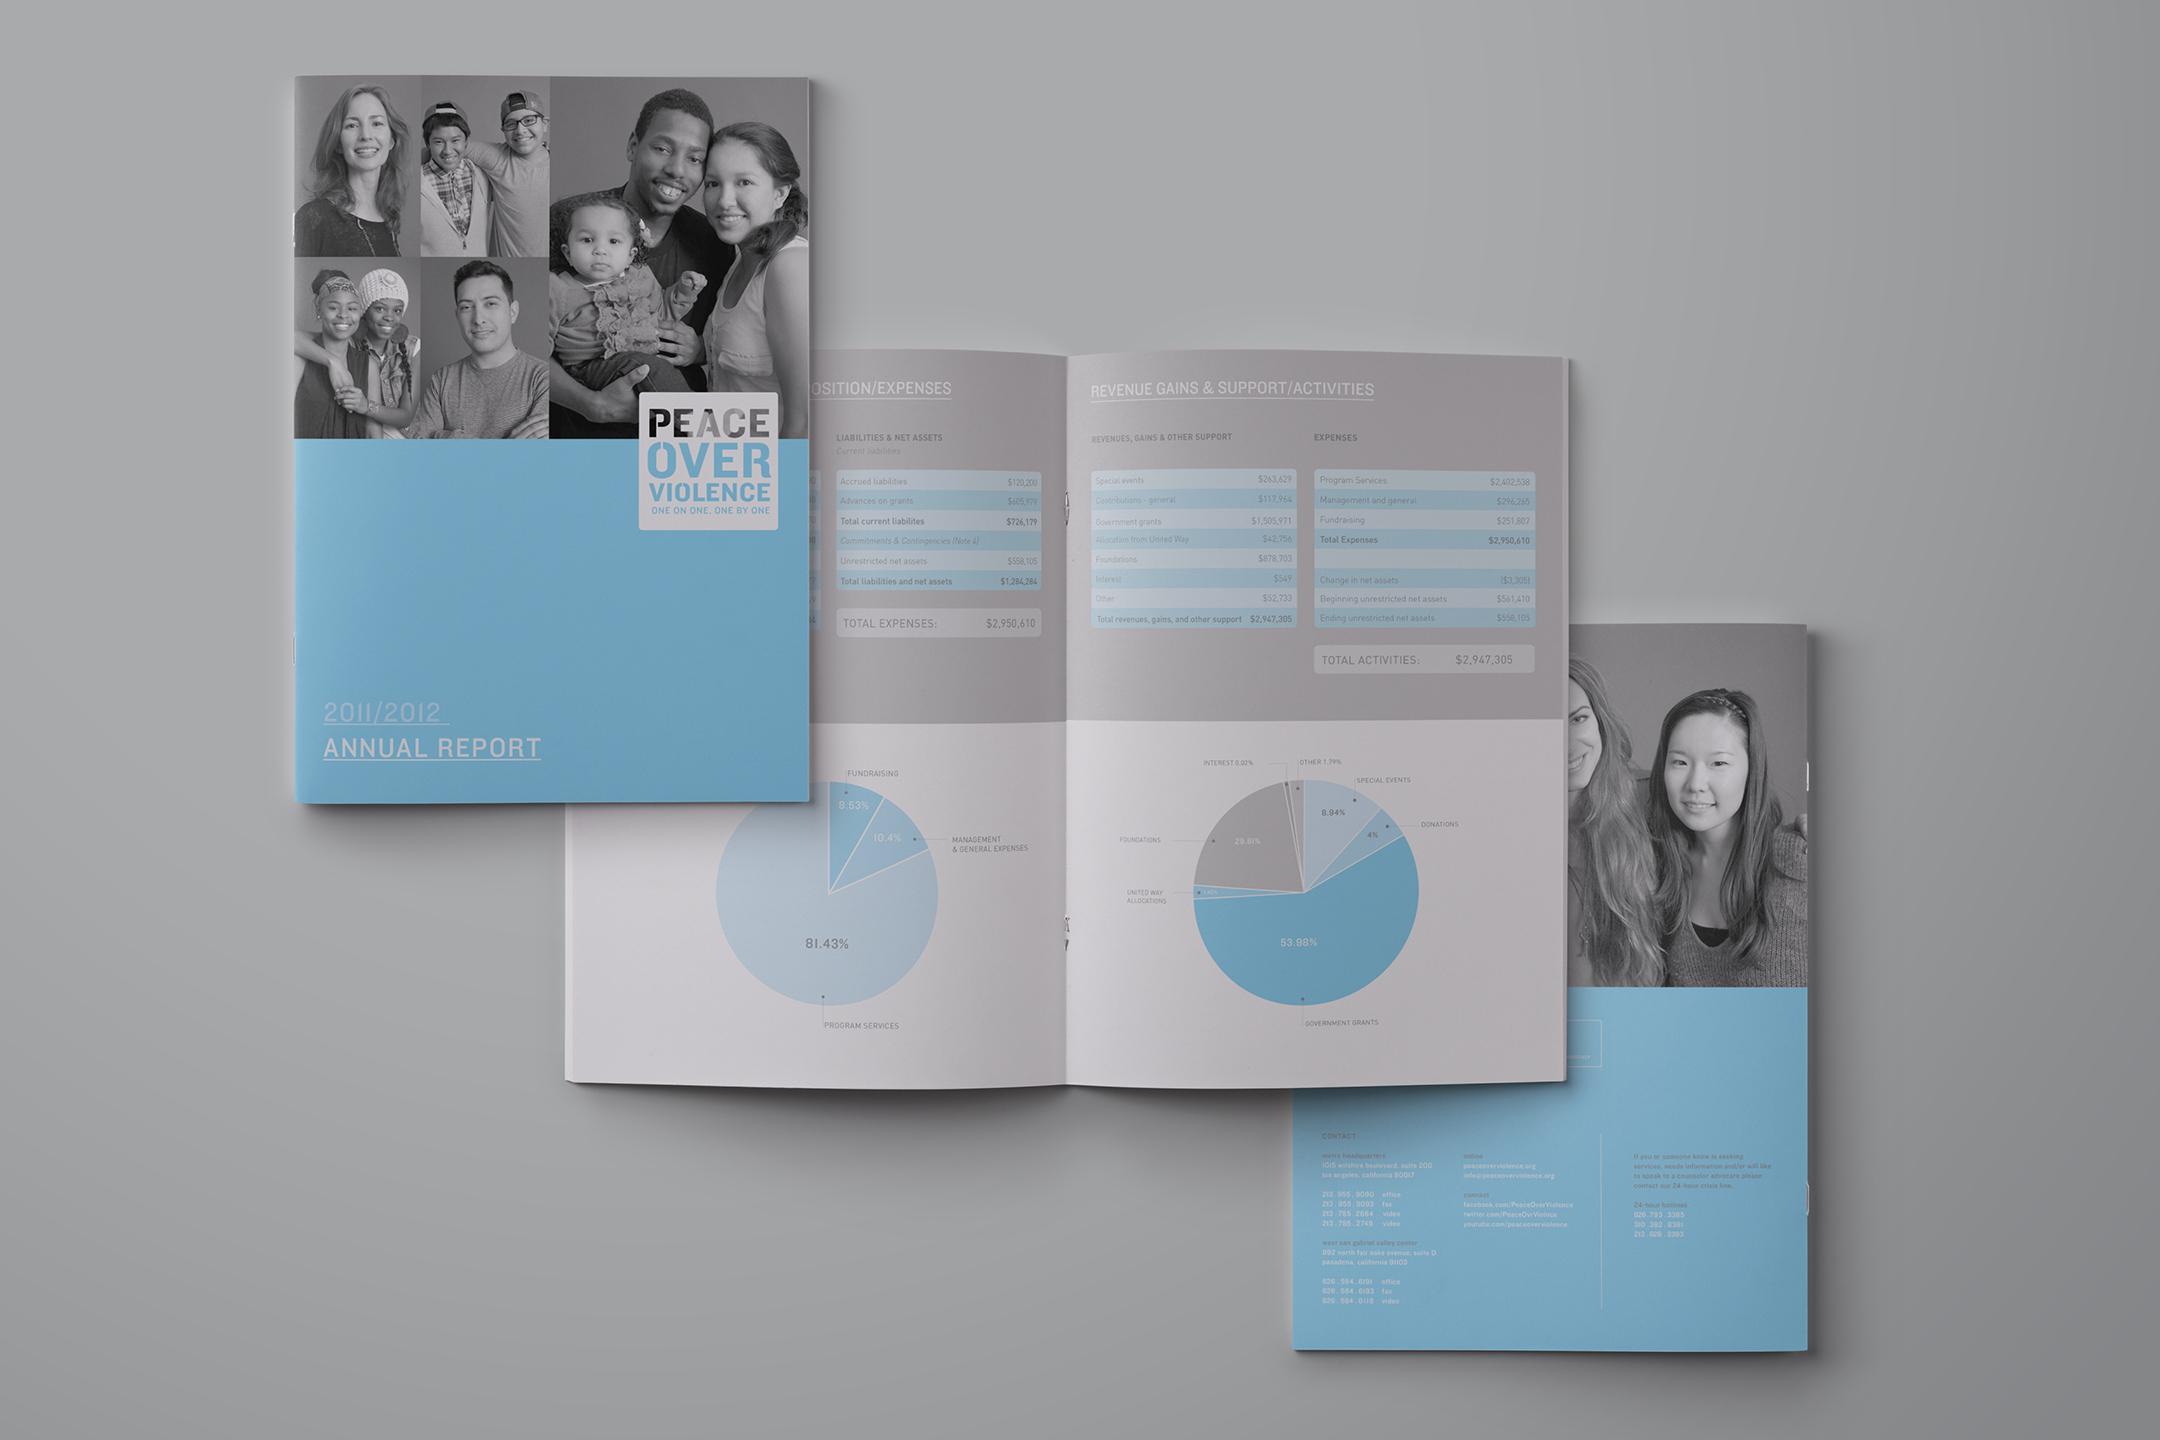 pov-annual-report-2.jpg